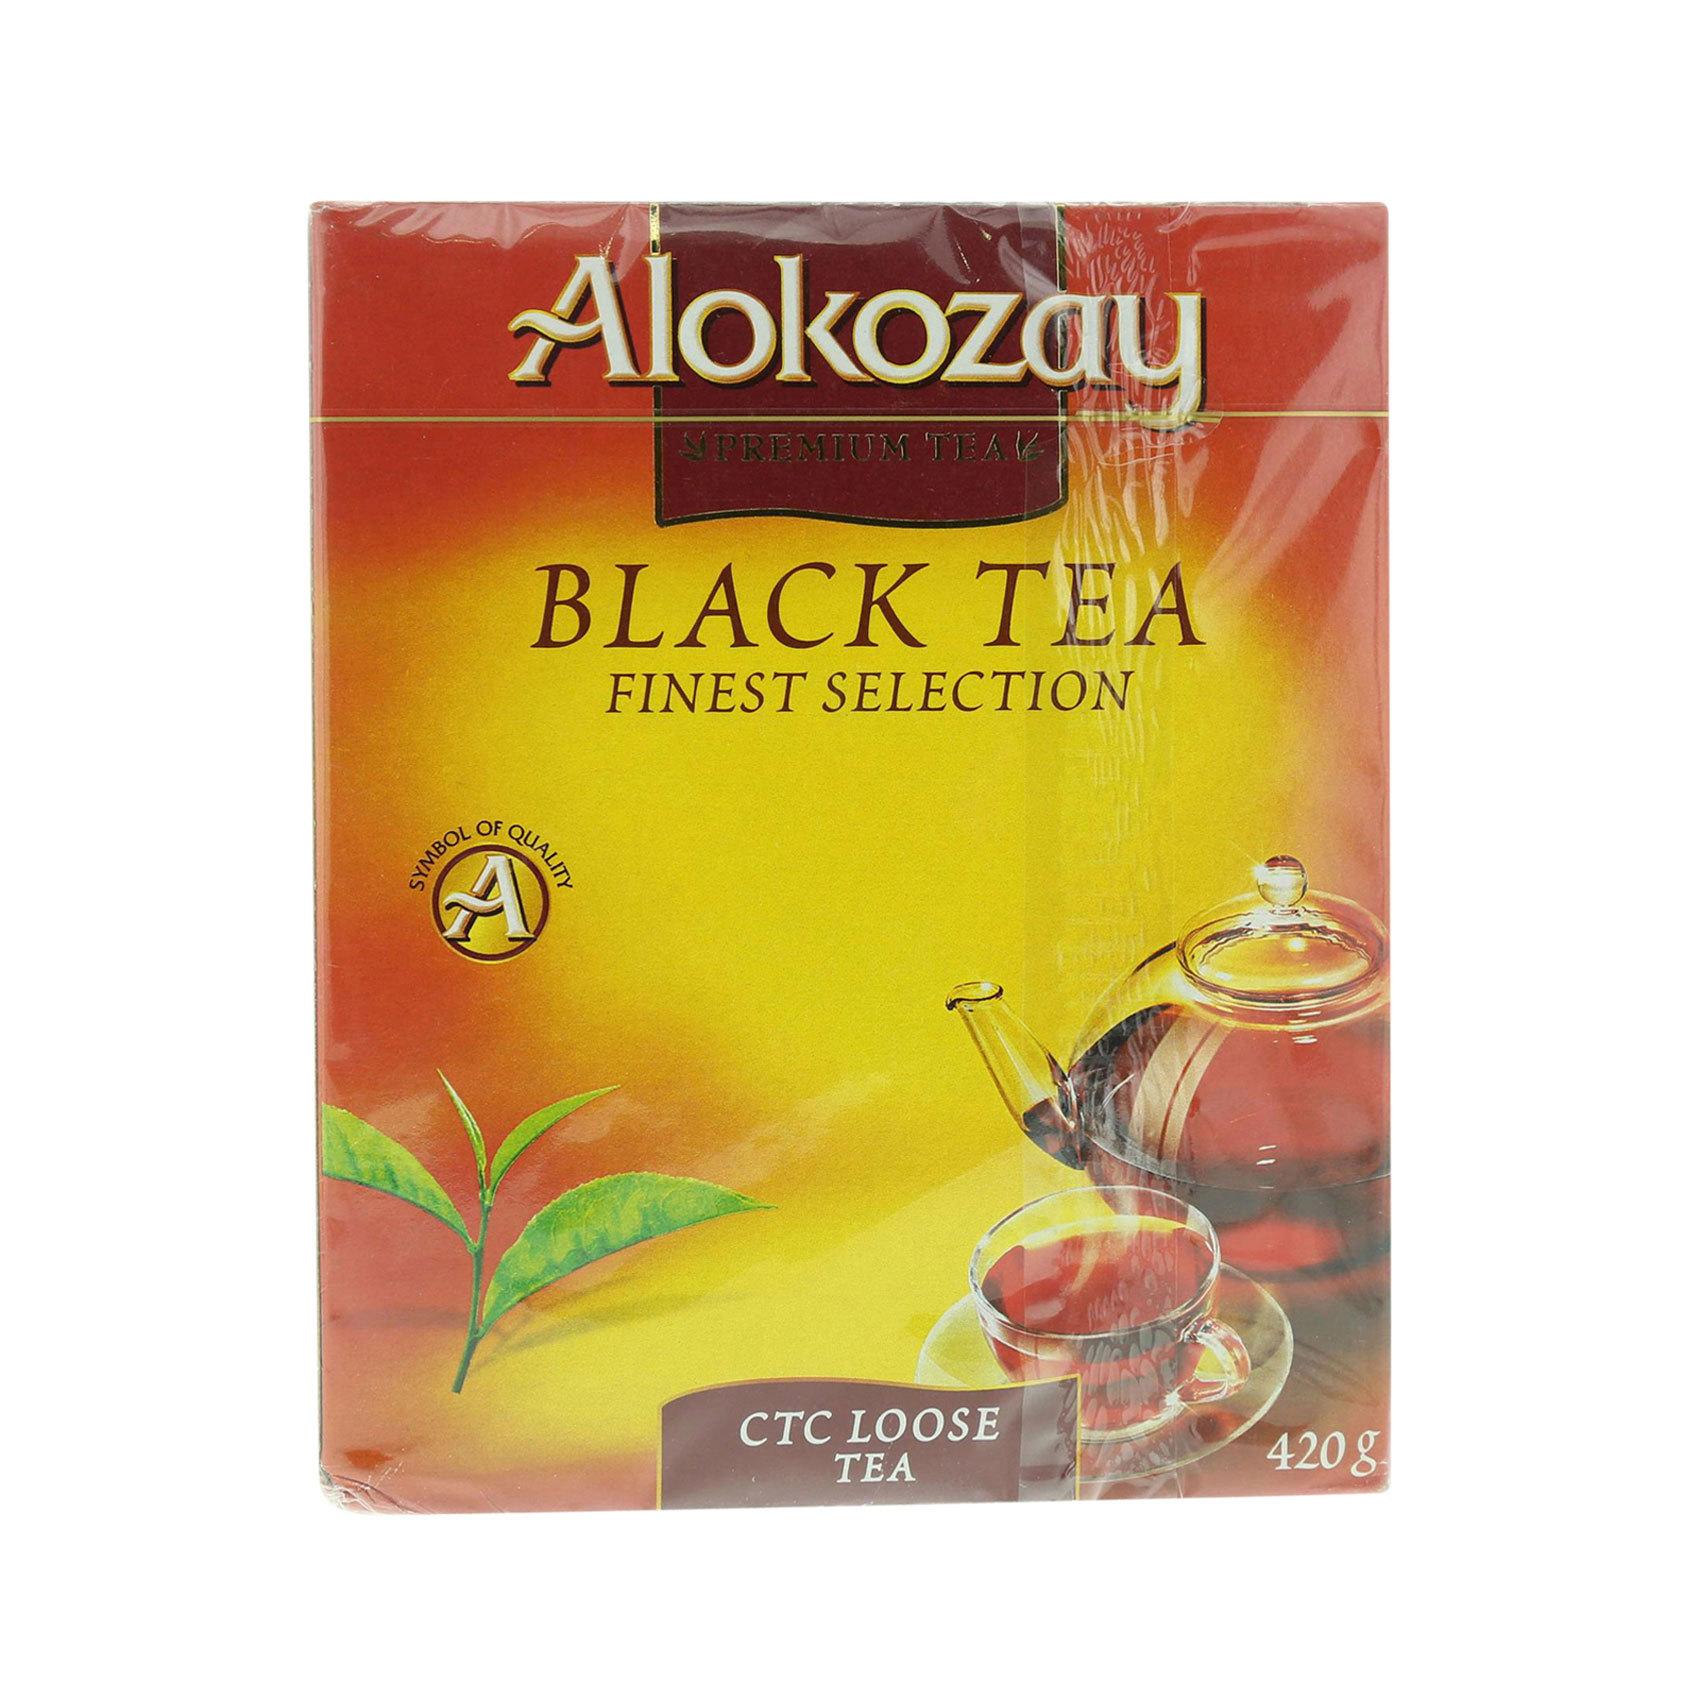 ALOKOZAY LOOSE TEA 420G